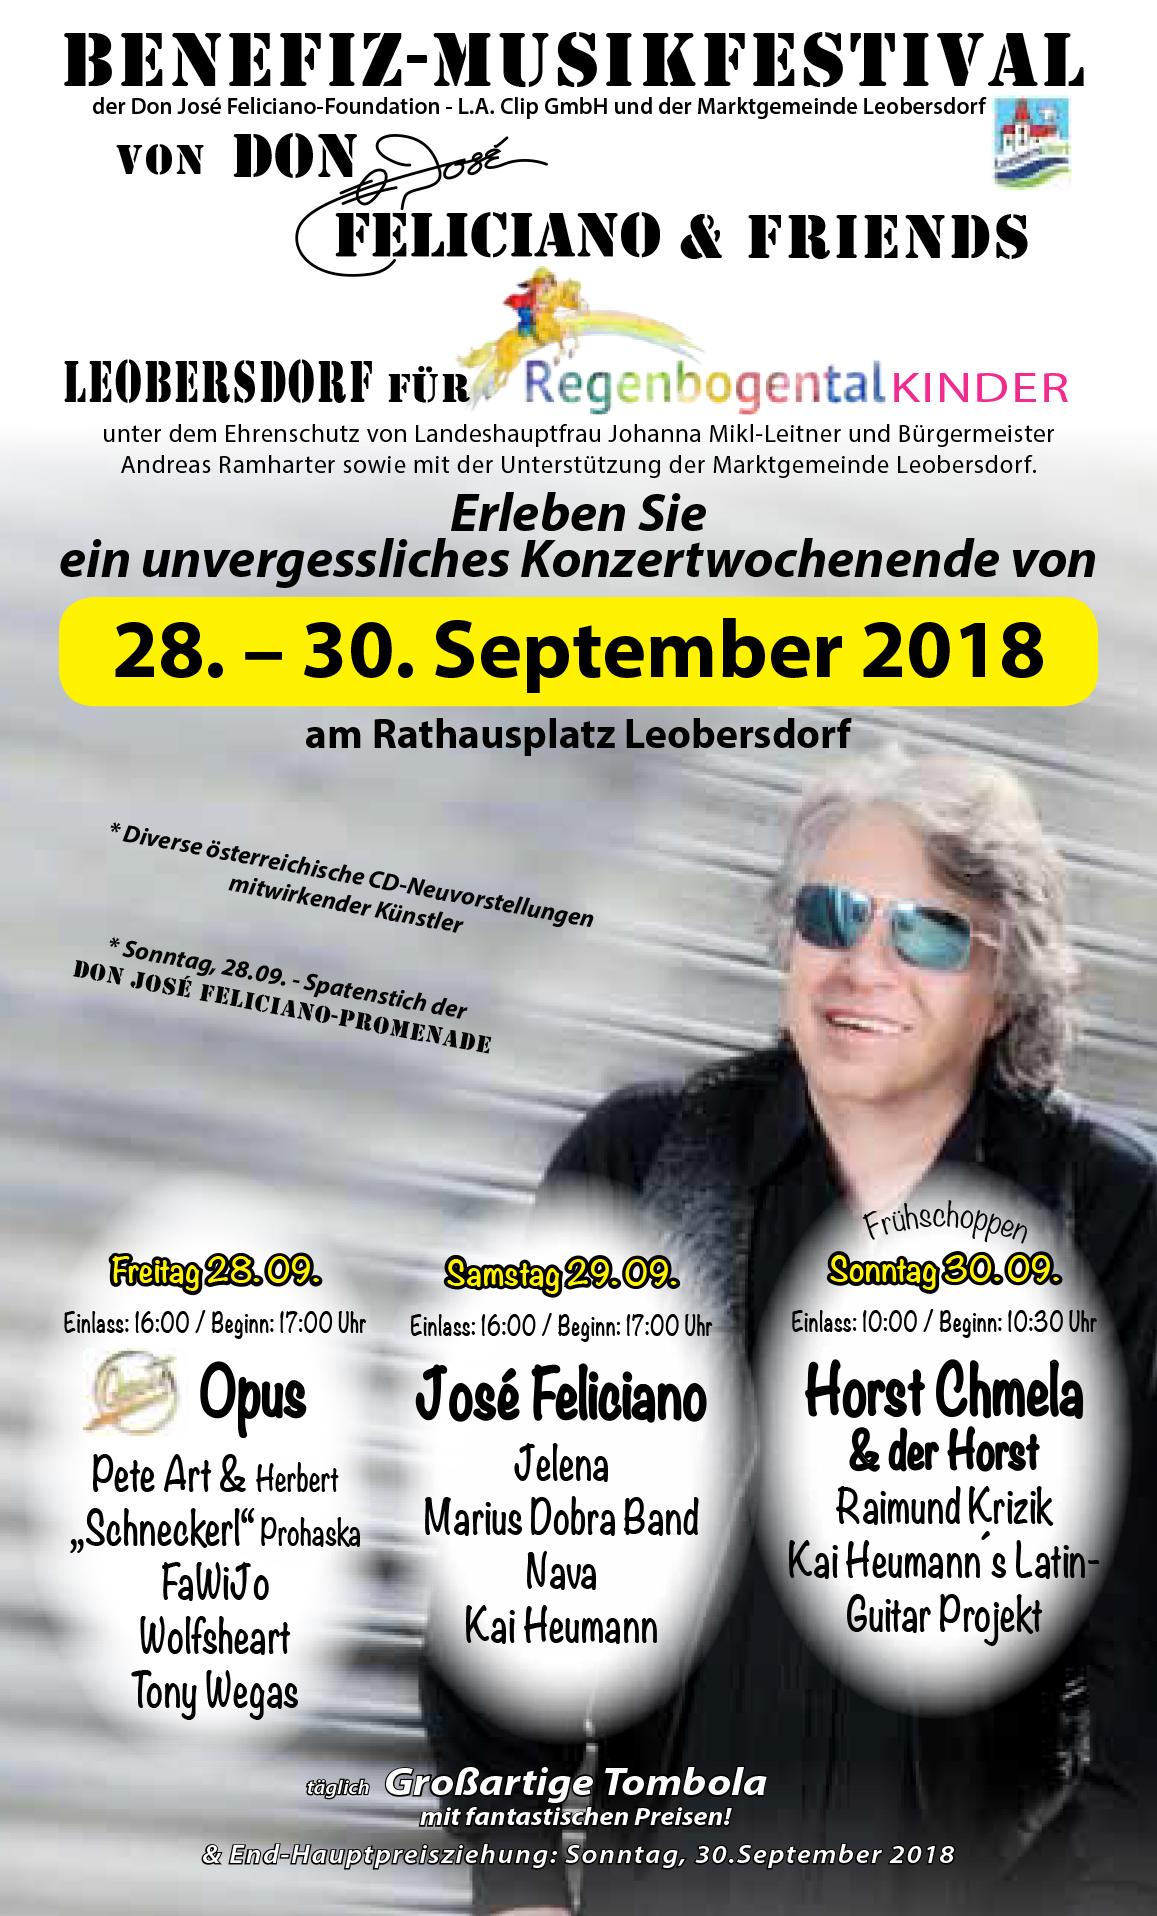 Benefiz_Musikfestival_LO_2018_Flyer_Internet_S1.jpg